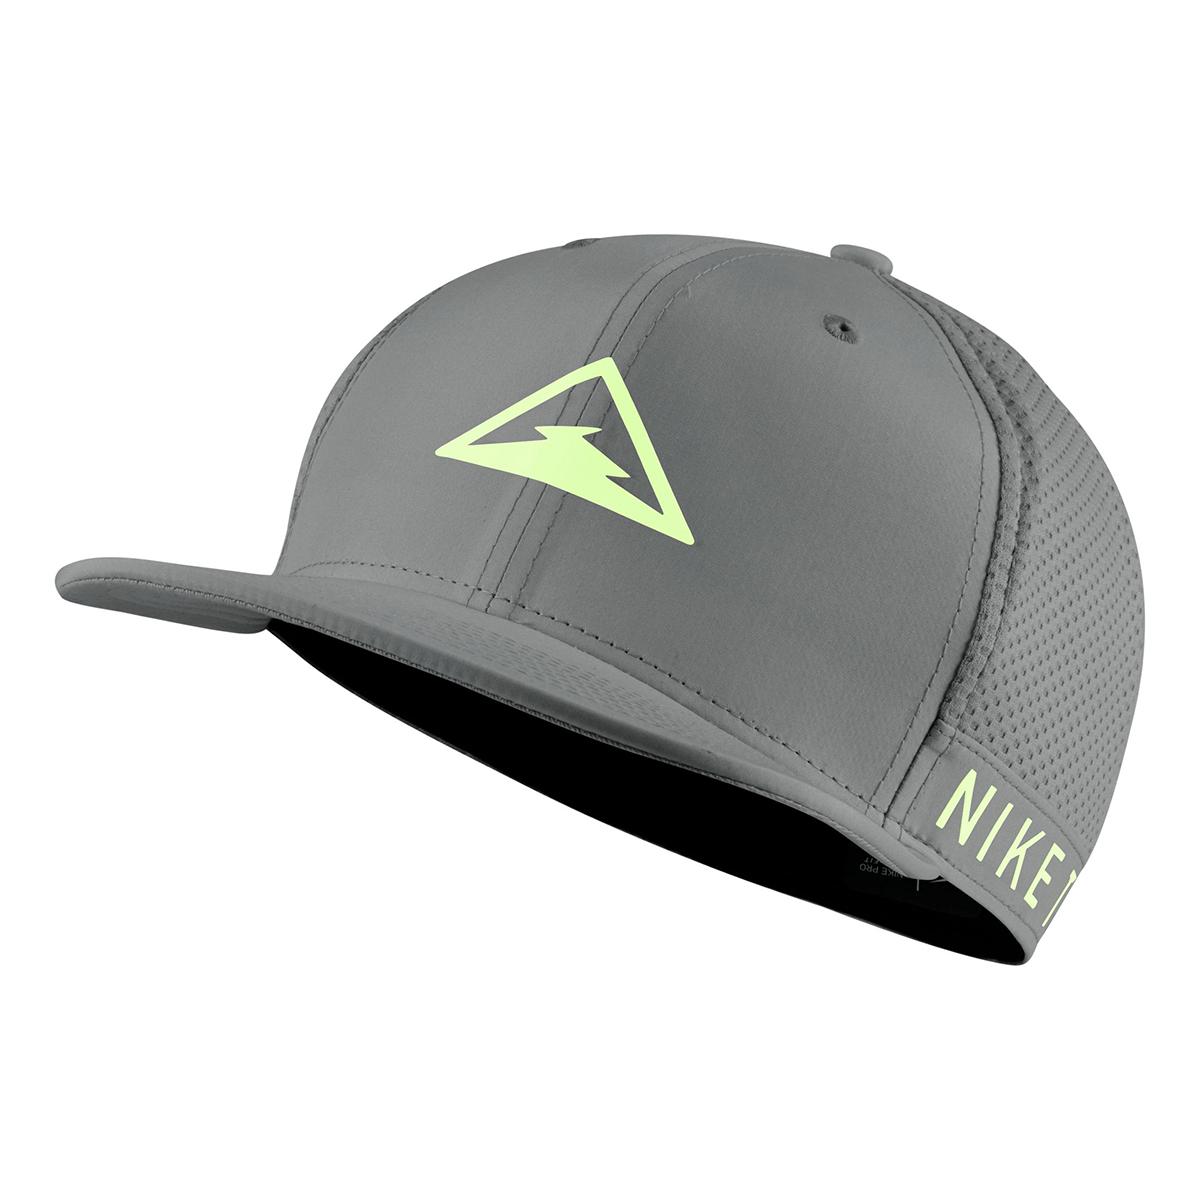 Nike Dri-FIT Pro Trail Cap - Color: Grey - Size: OS, Grey, large, image 1